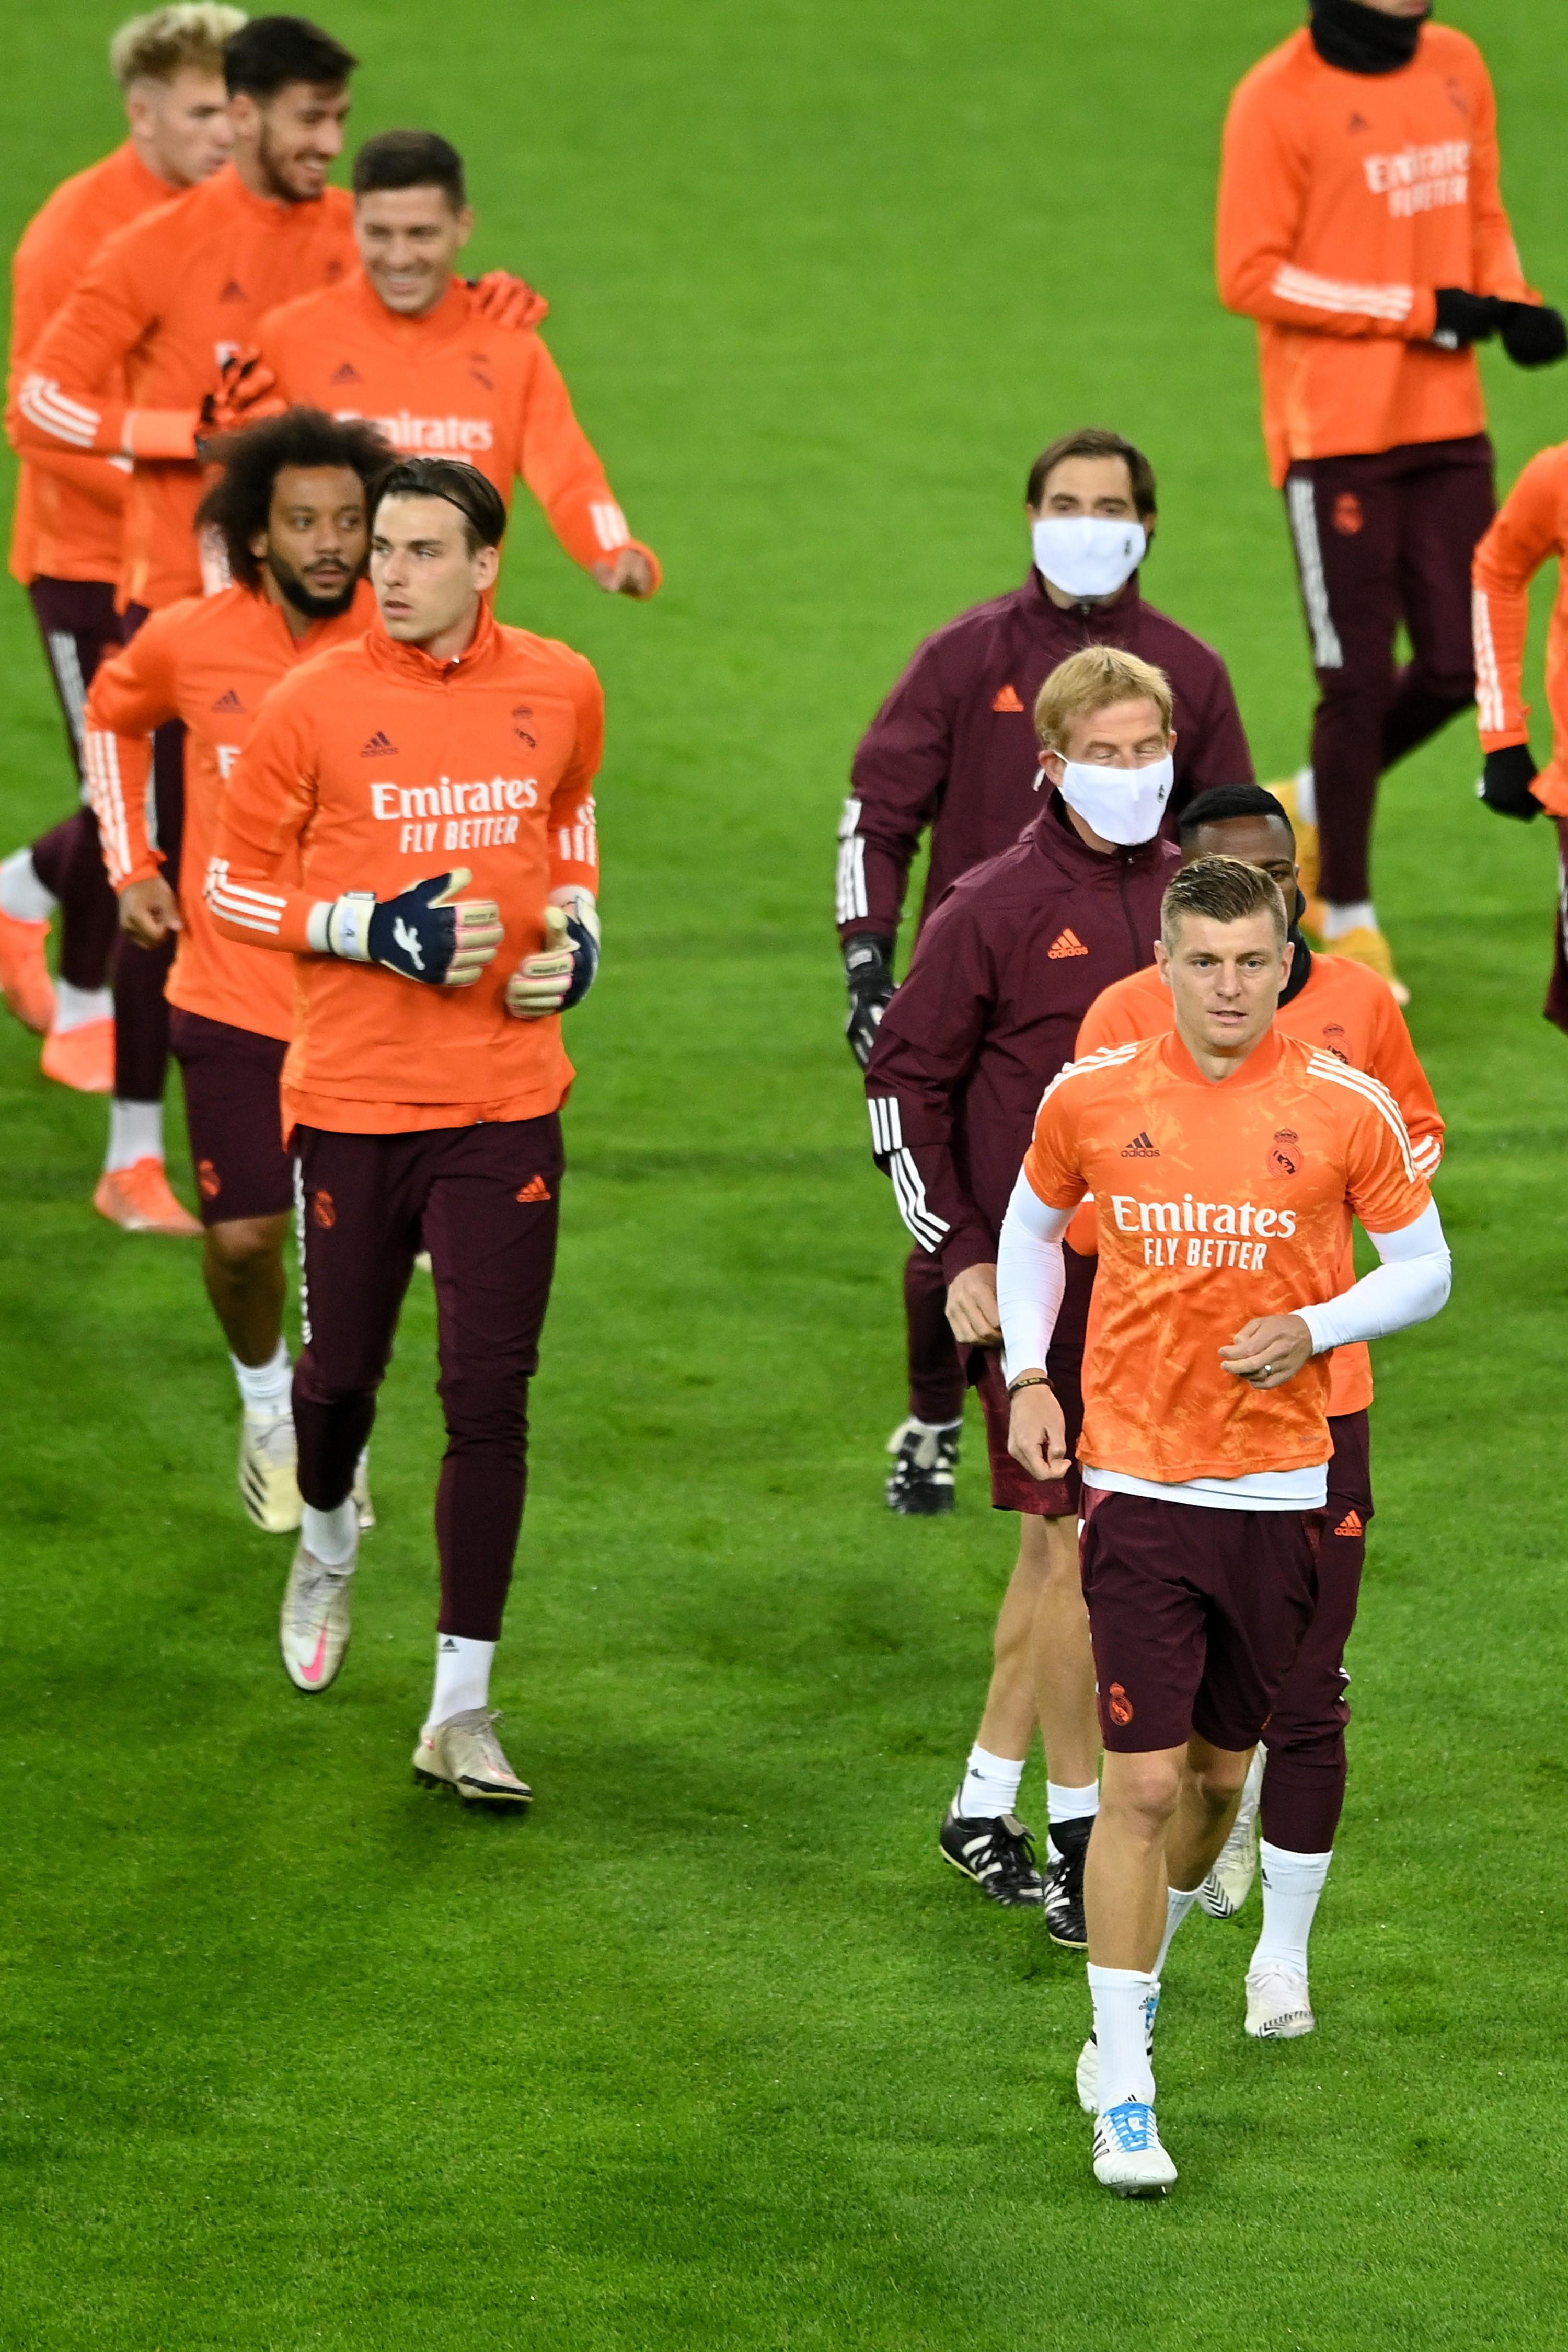 (SP)GERMANY-MOENCHENGLADBACH-FOOTBALL-UEFA CHAMPIONS LEAGUE-REAL MADRID-TRAINING